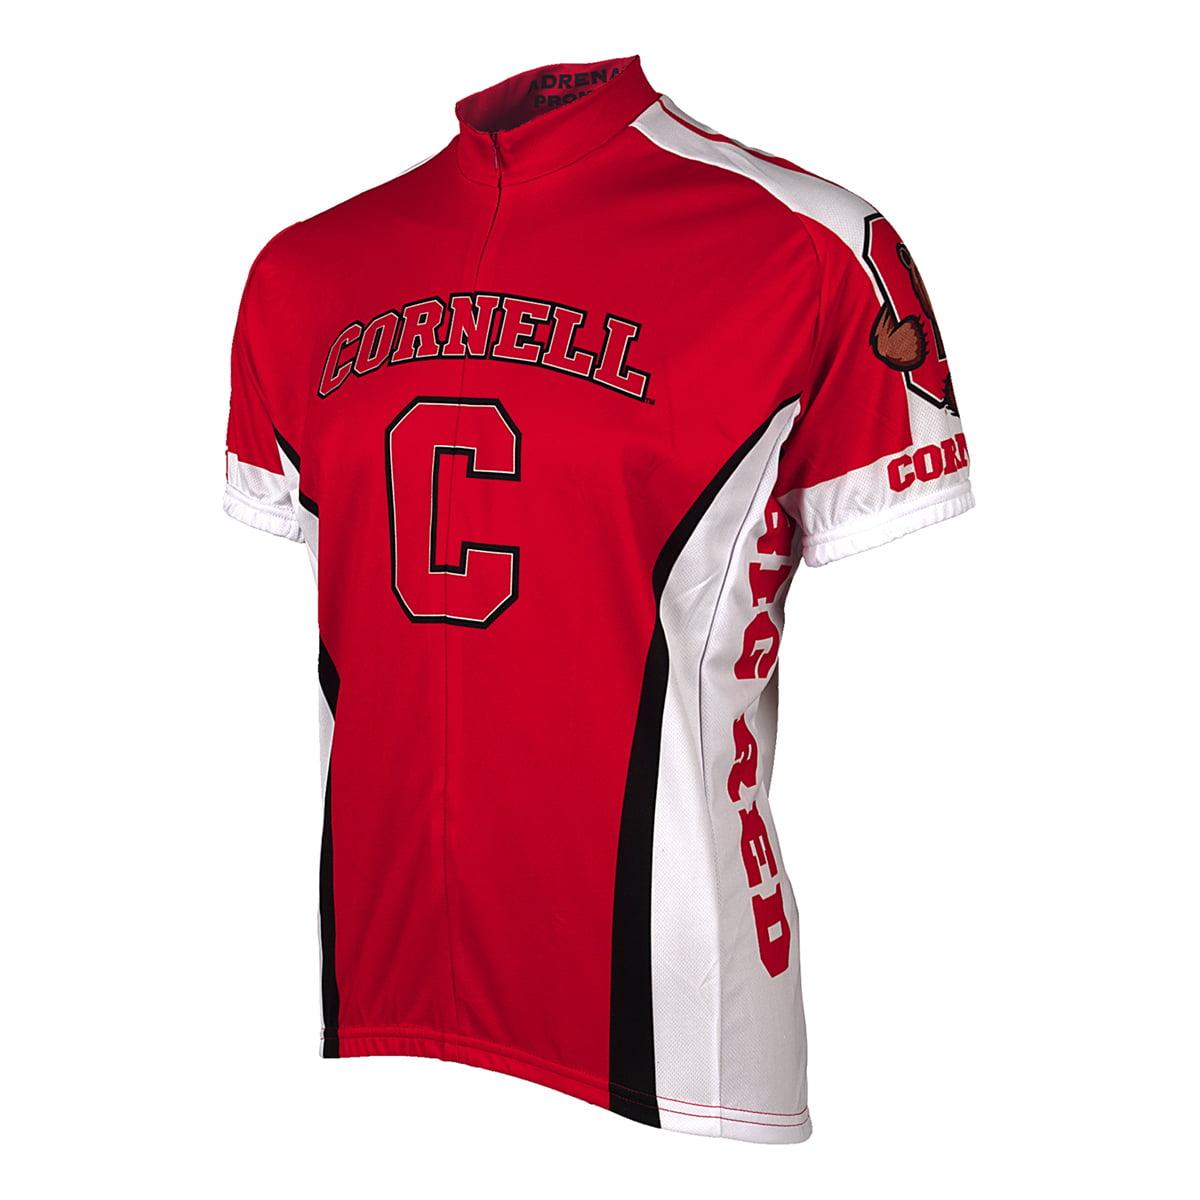 Adrenaline Promotions Cornell University Bears Cycling Jersey